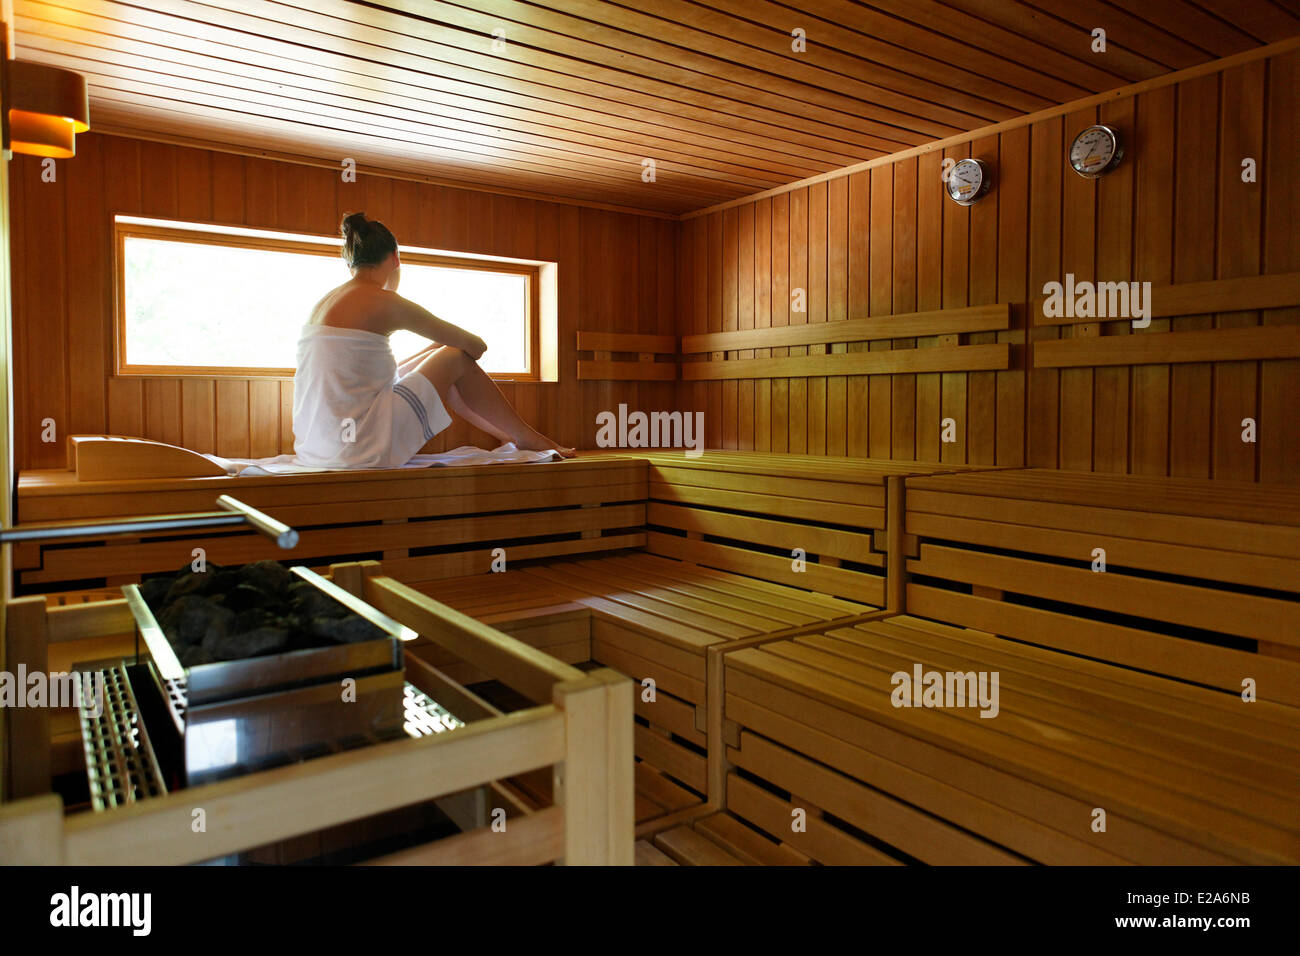 la petite pierre stockfotos la petite pierre bilder alamy. Black Bedroom Furniture Sets. Home Design Ideas